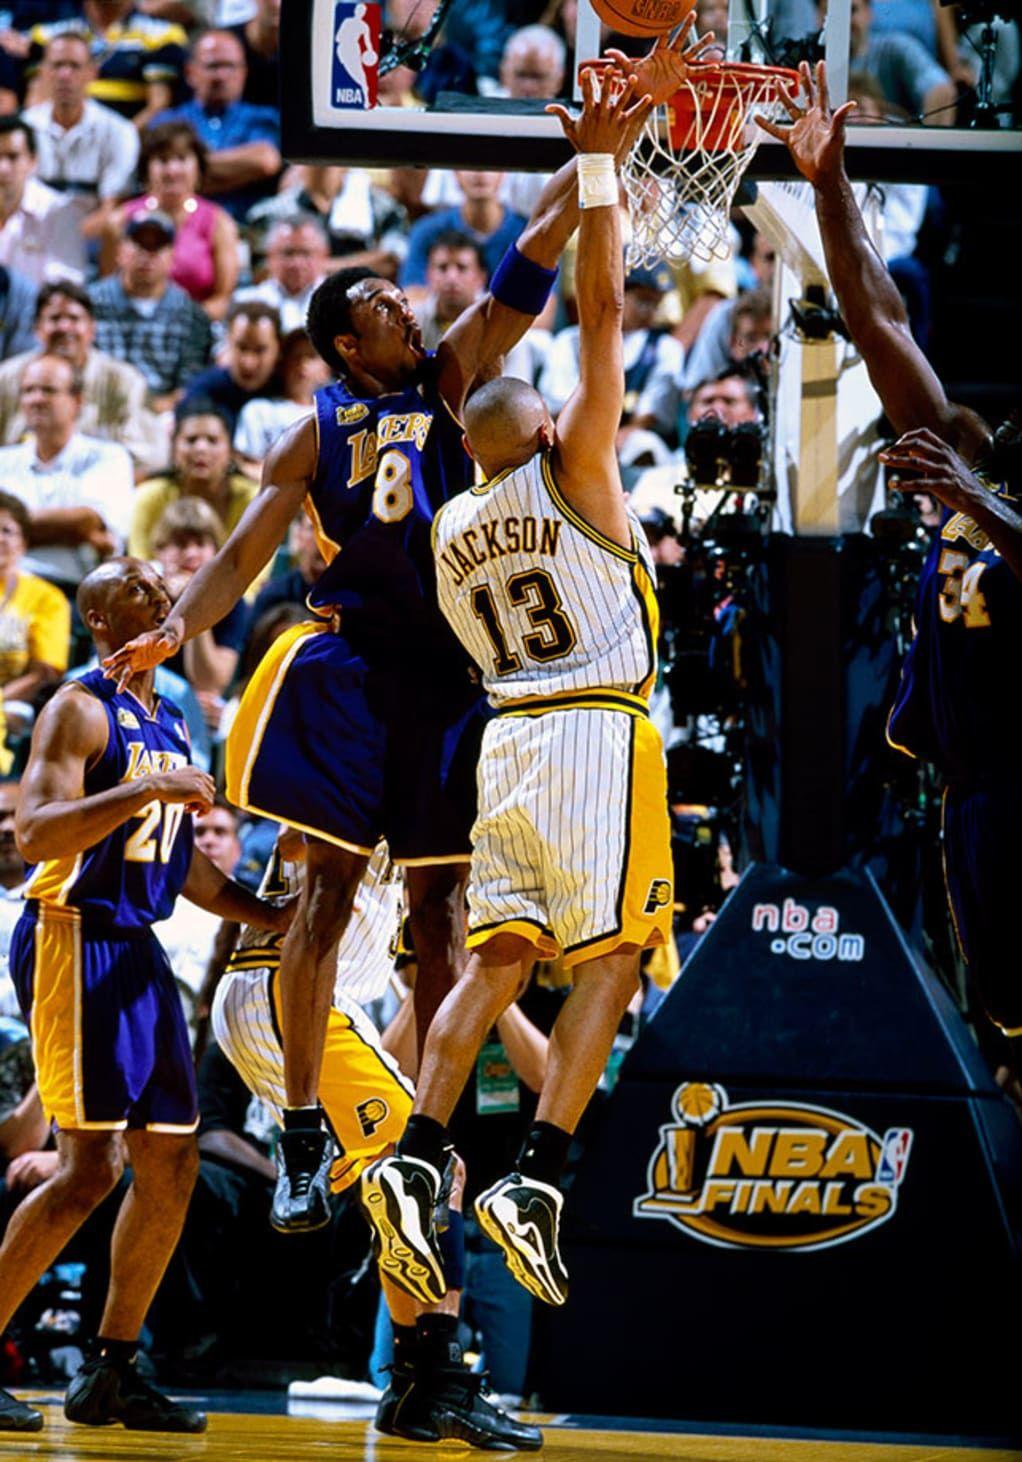 100 Best Kobe Bryant Photos Kobe Bryant Kobe Bryant Nba Kobe Bryant Number